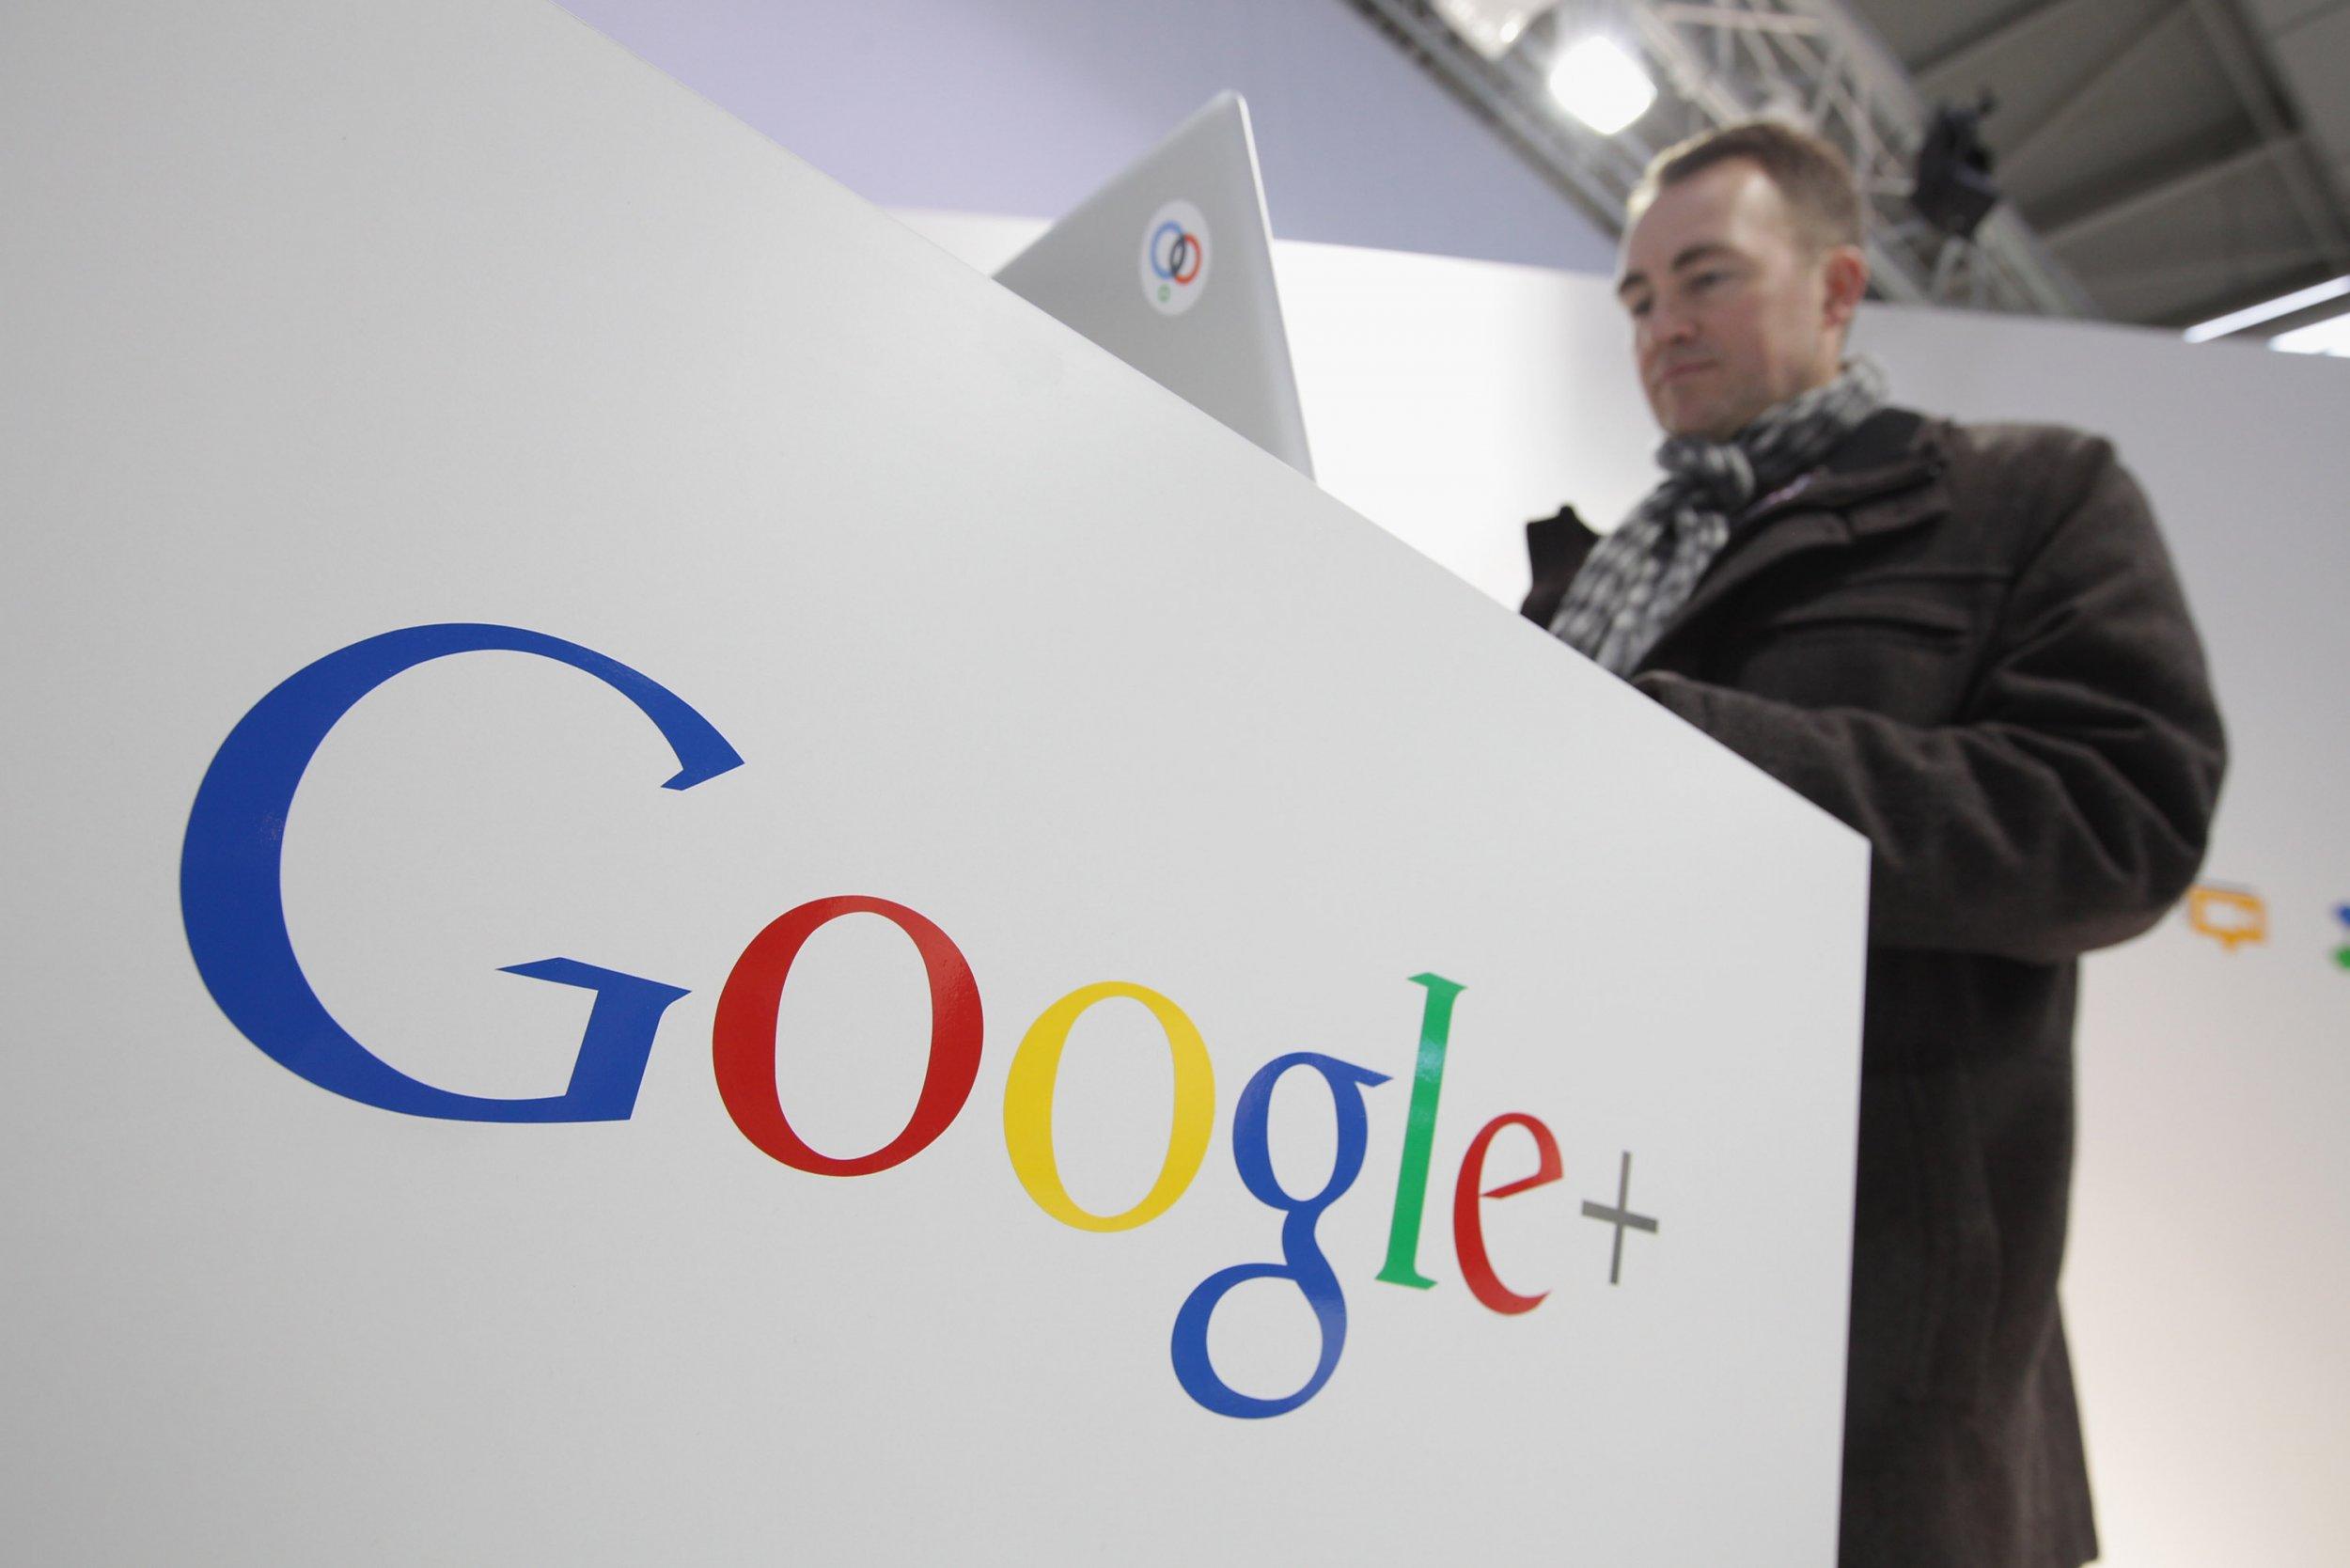 google symbol and laptop